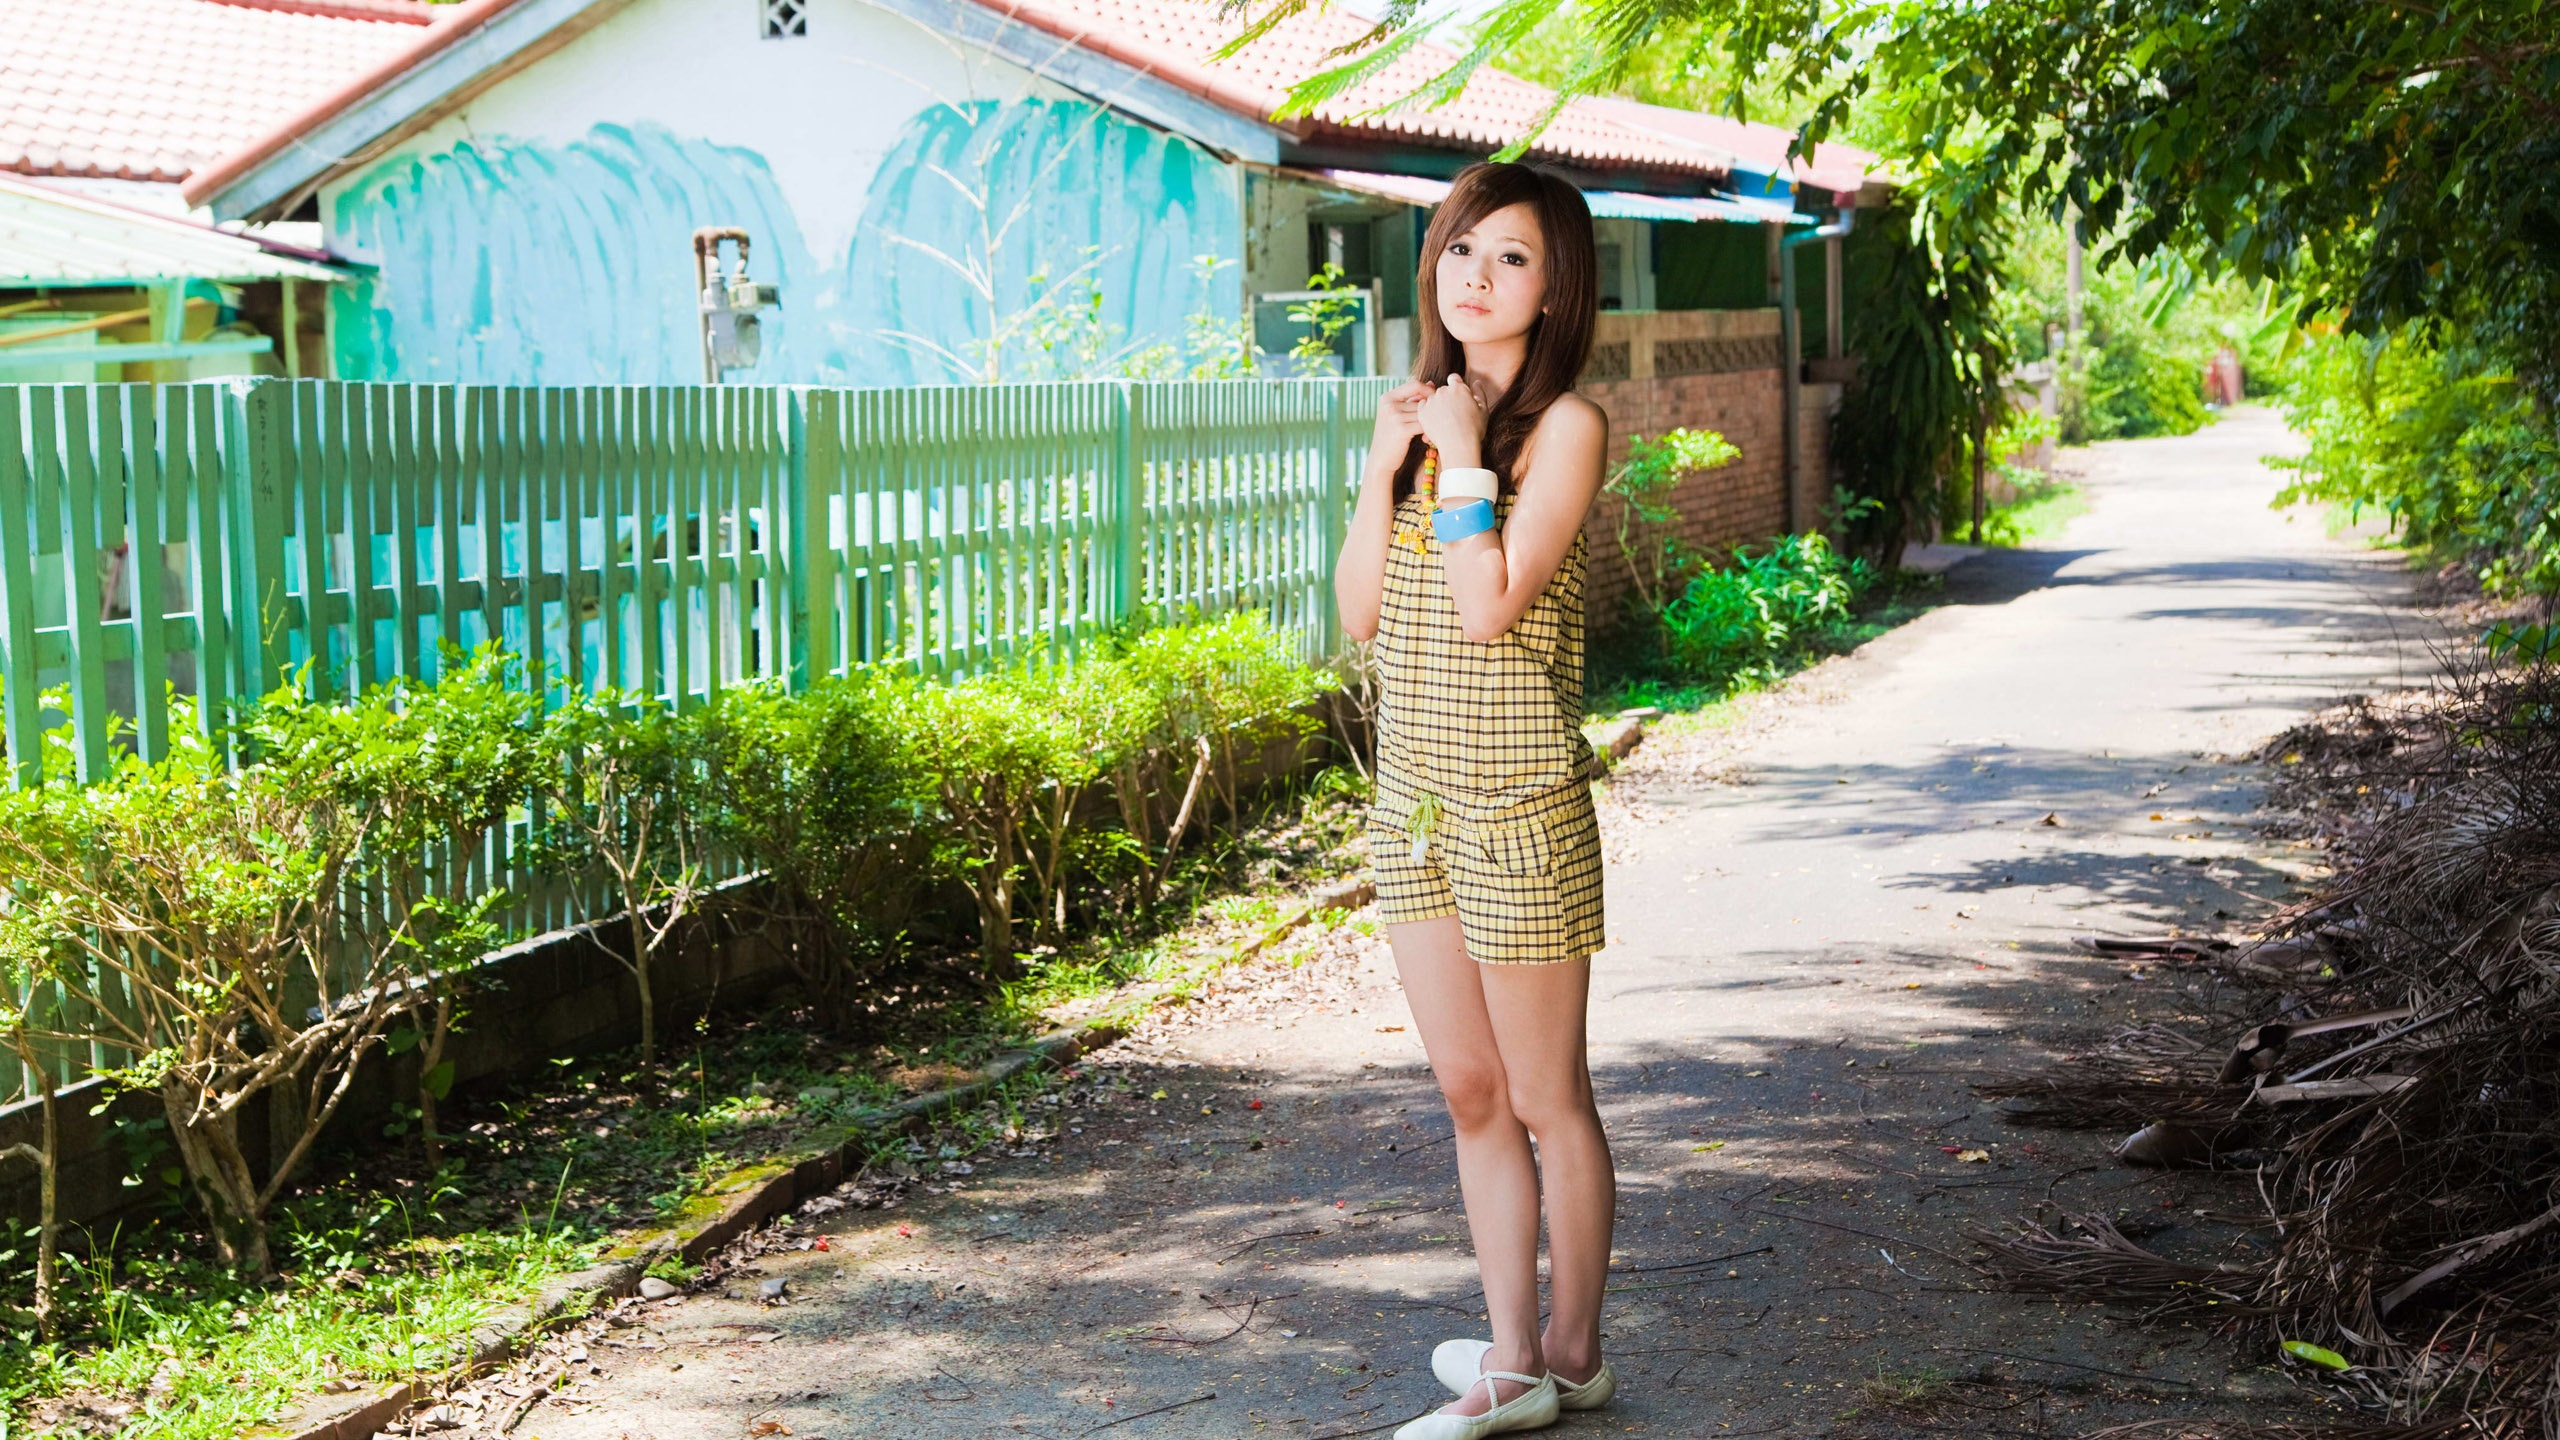 taiwan beaufiful girl mikako - photo #16